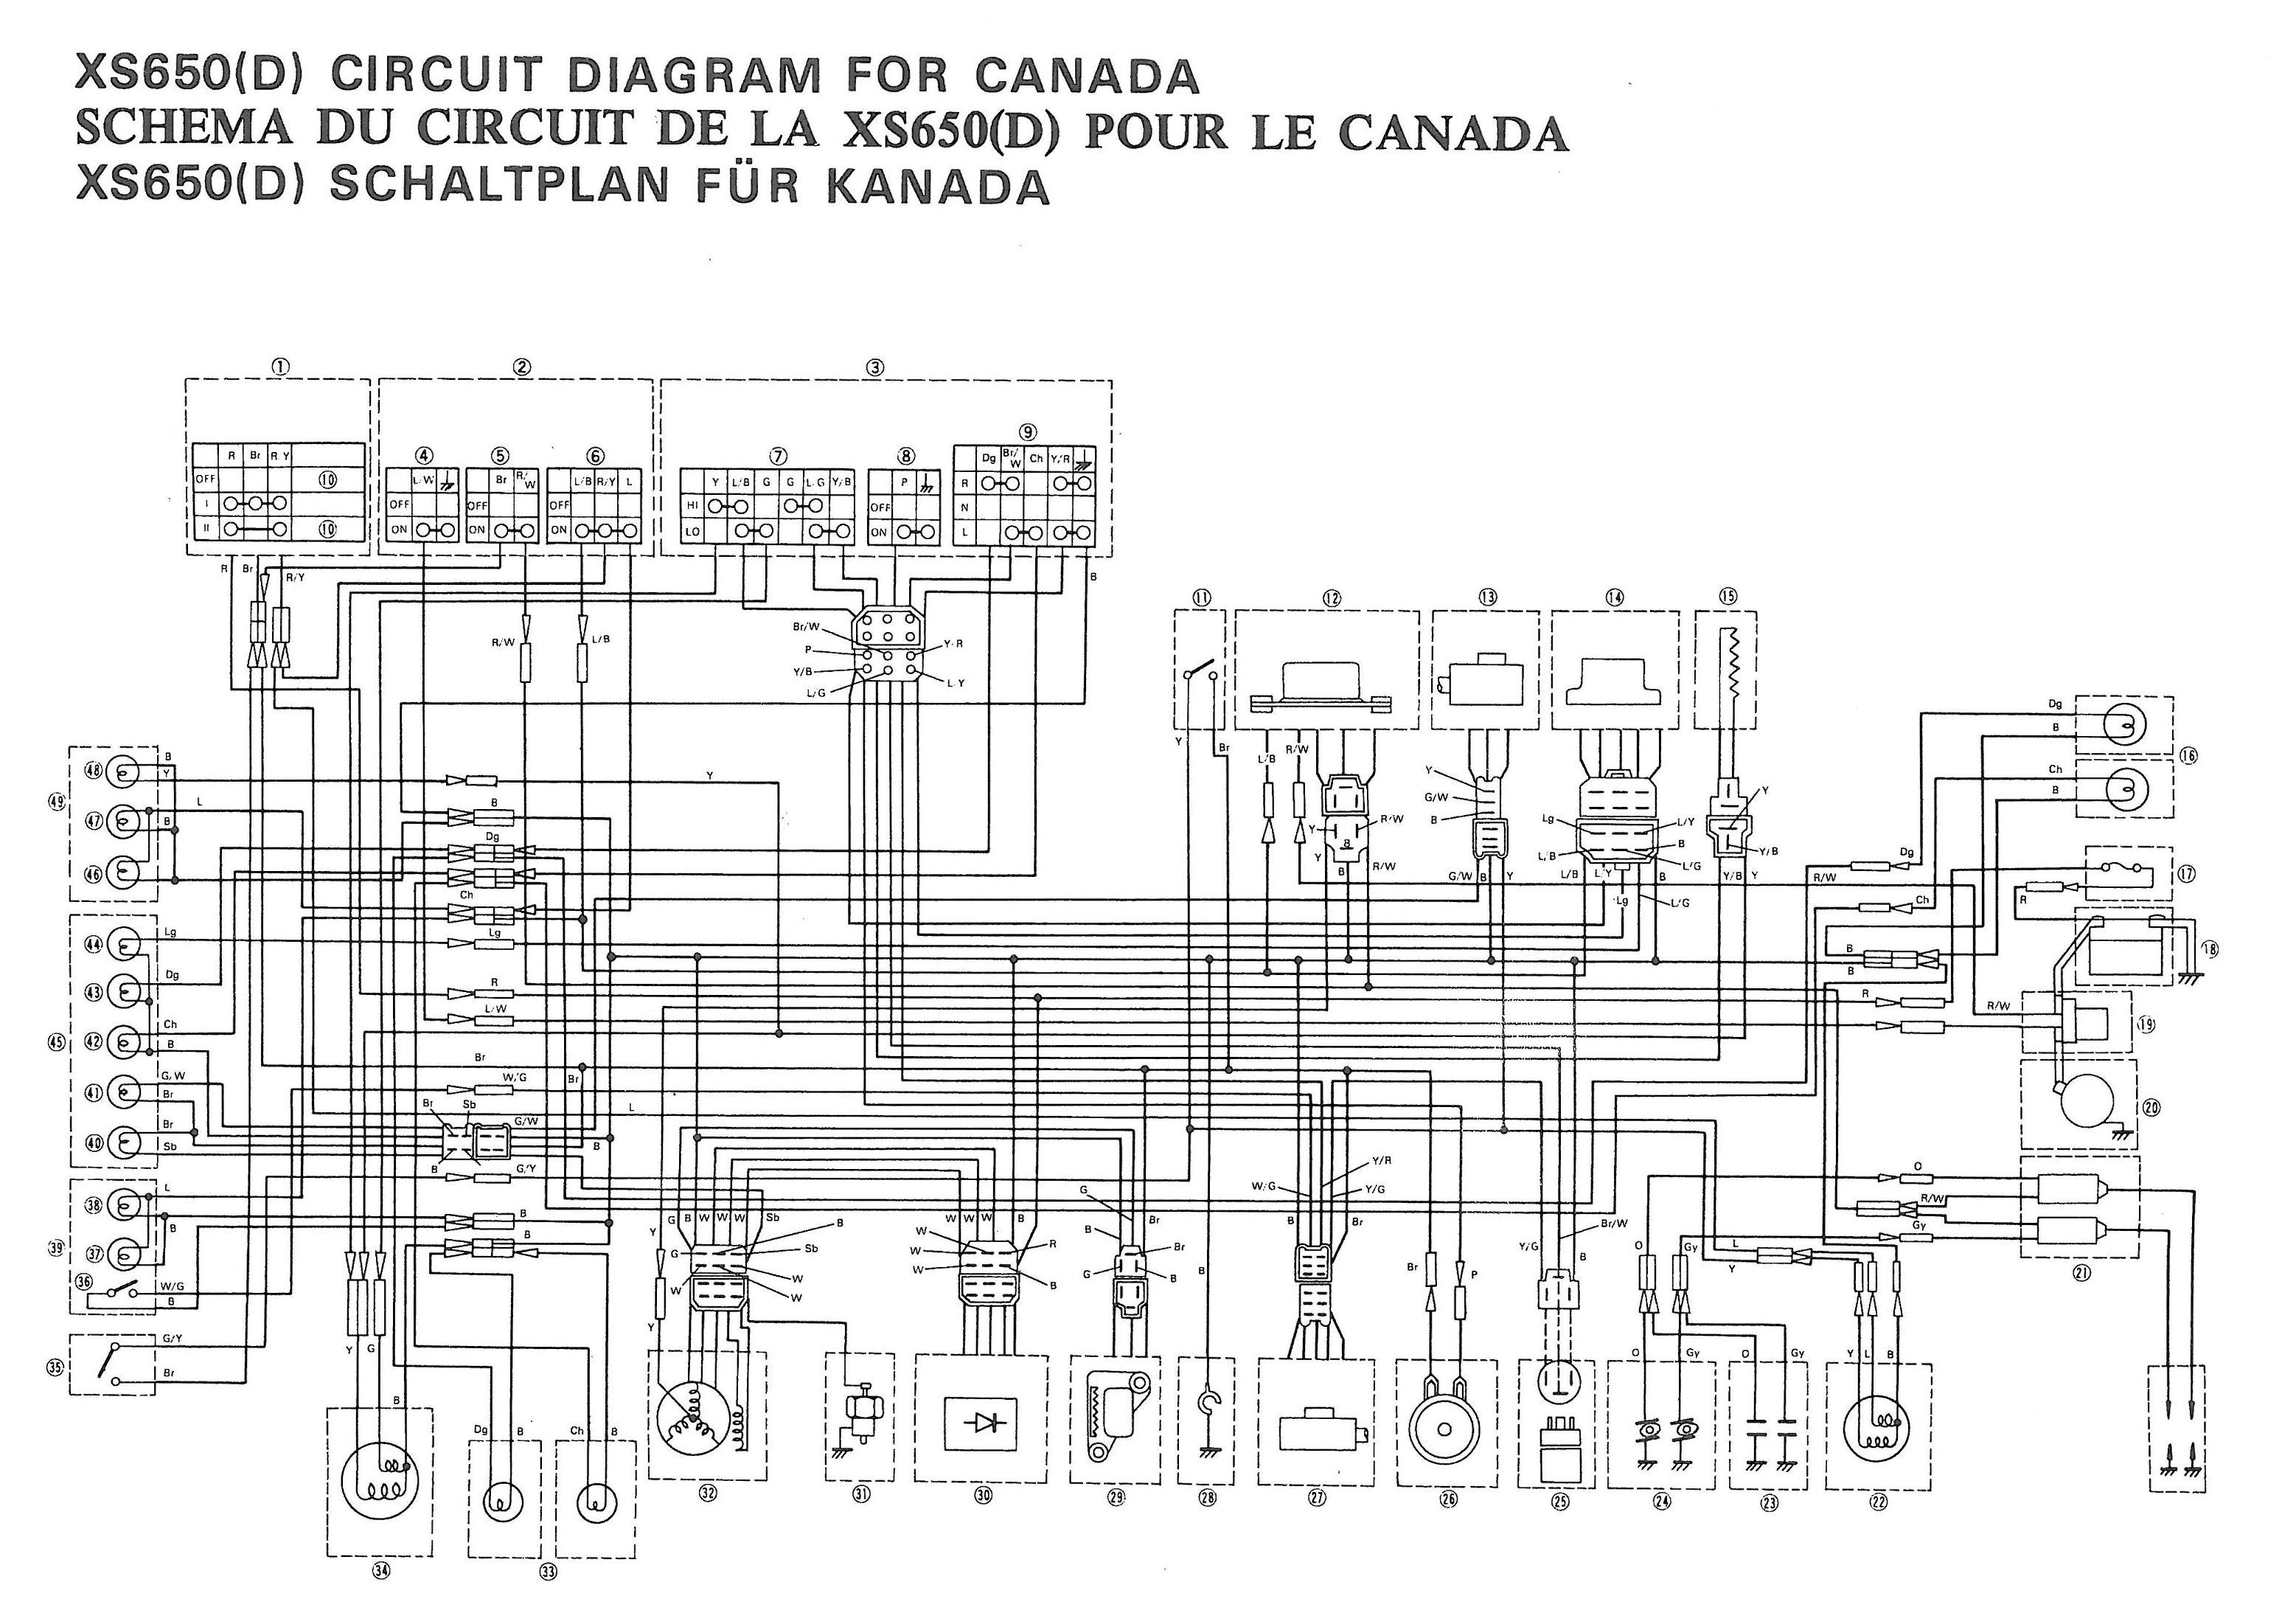 medium resolution of 1979 yamaha xs750 special wiring diagram hobbiesxstyle 1981 xs650 wiring diagram 1978 yamaha xs650 wiring diagram